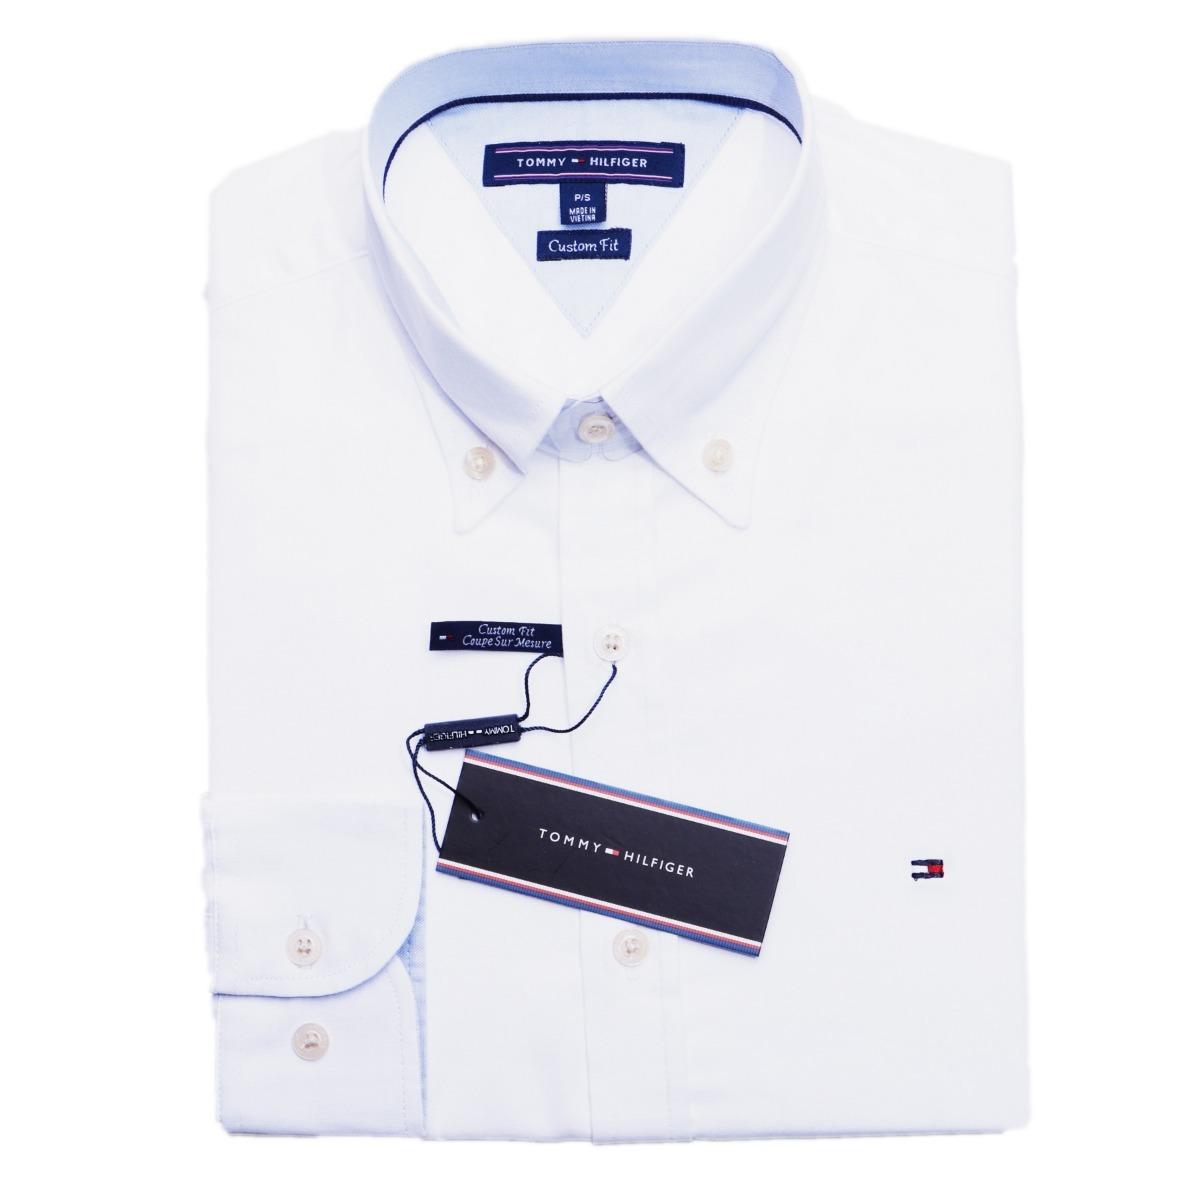 dca4270bef camisa social tommy hilfiger masc custom fit branca original. Carregando  zoom.